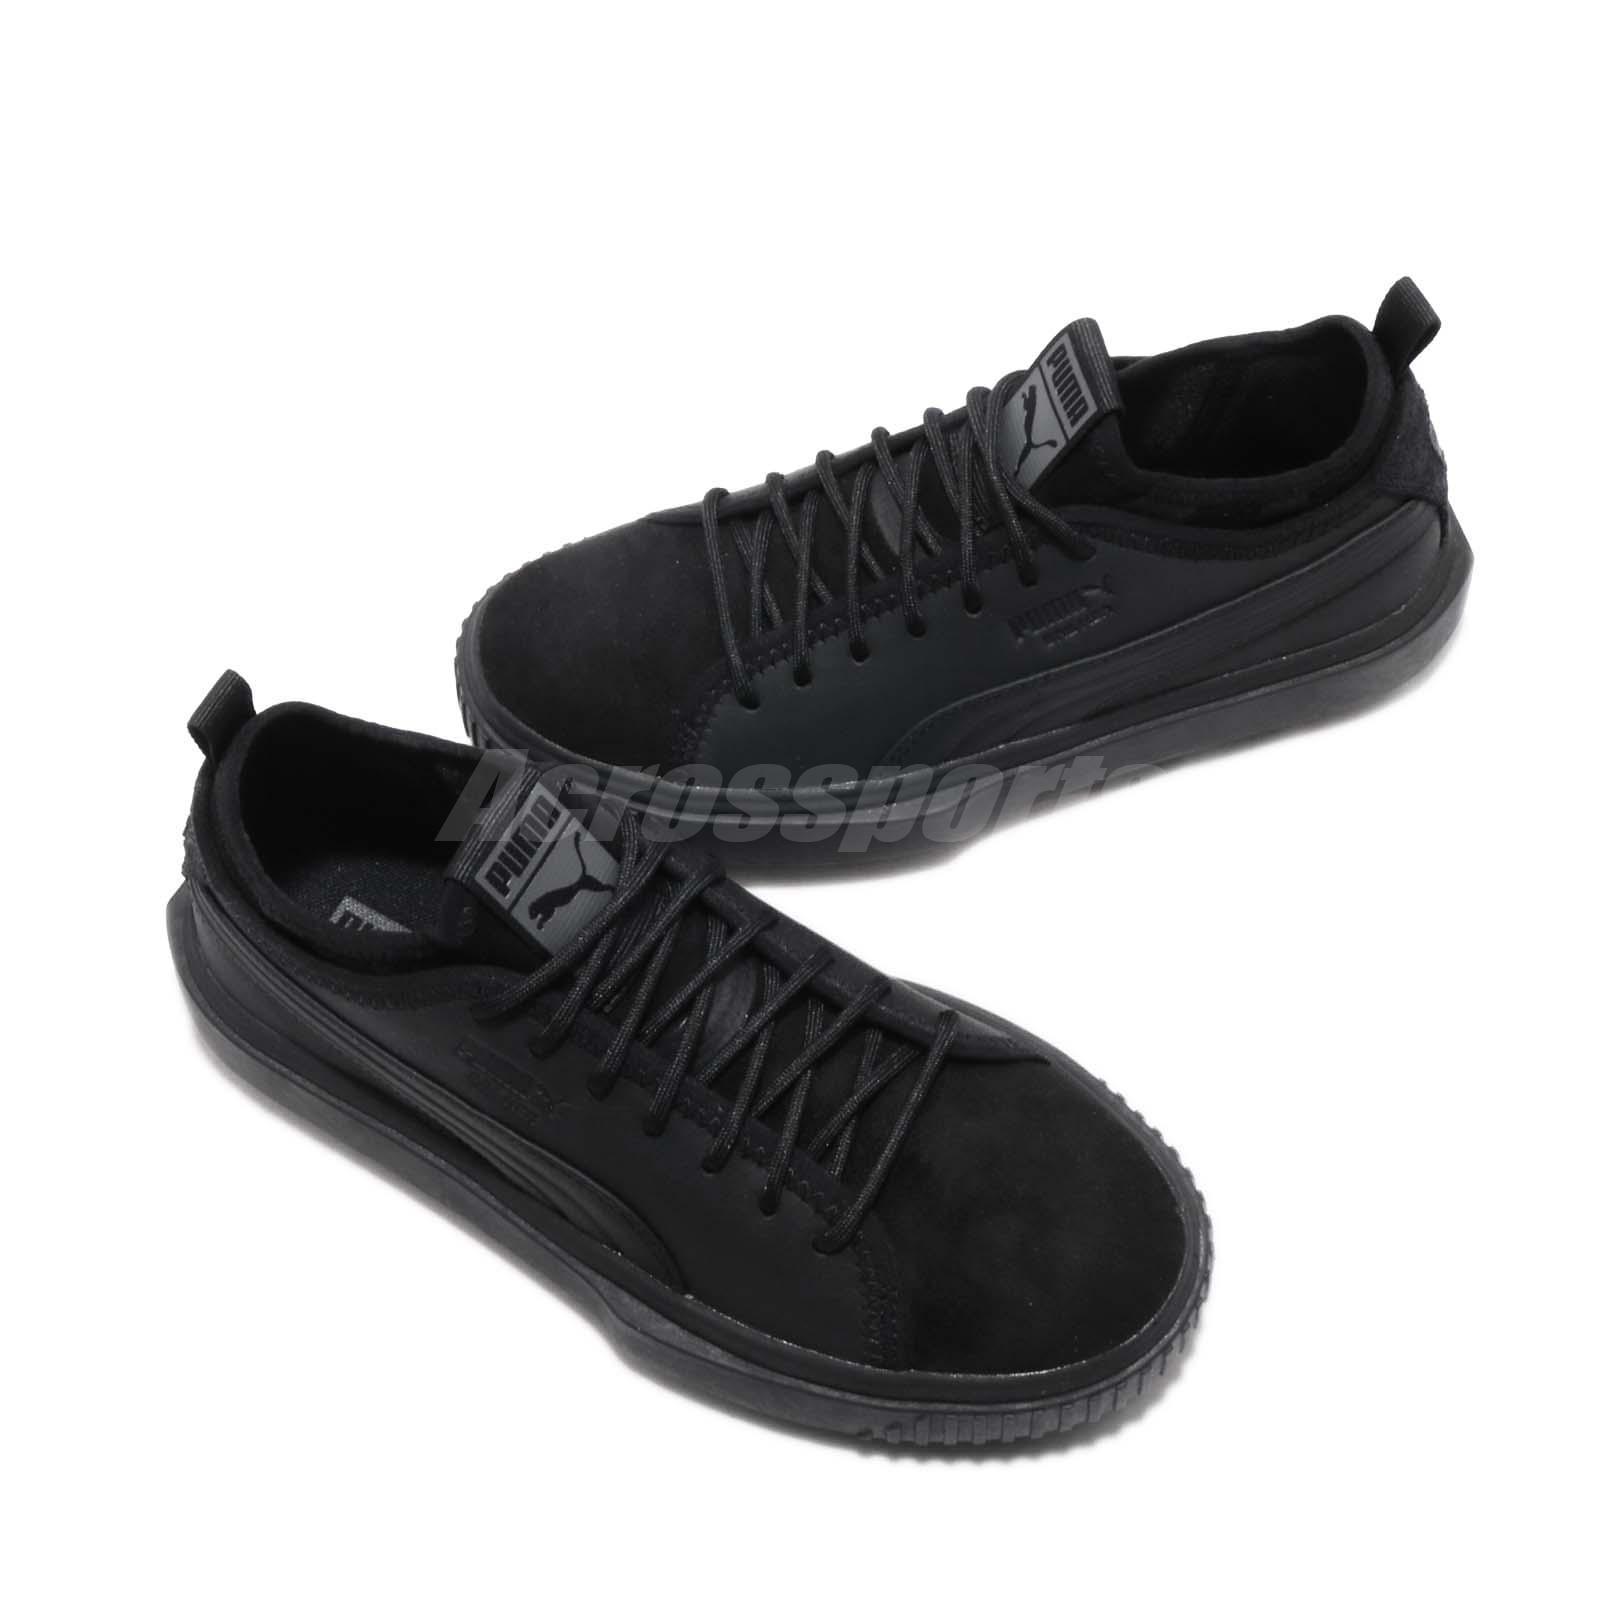 ce6d480bbf1b9b Puma Breaker Mesh PA Black Grey Men Women Casual Shoes Sneakers ...